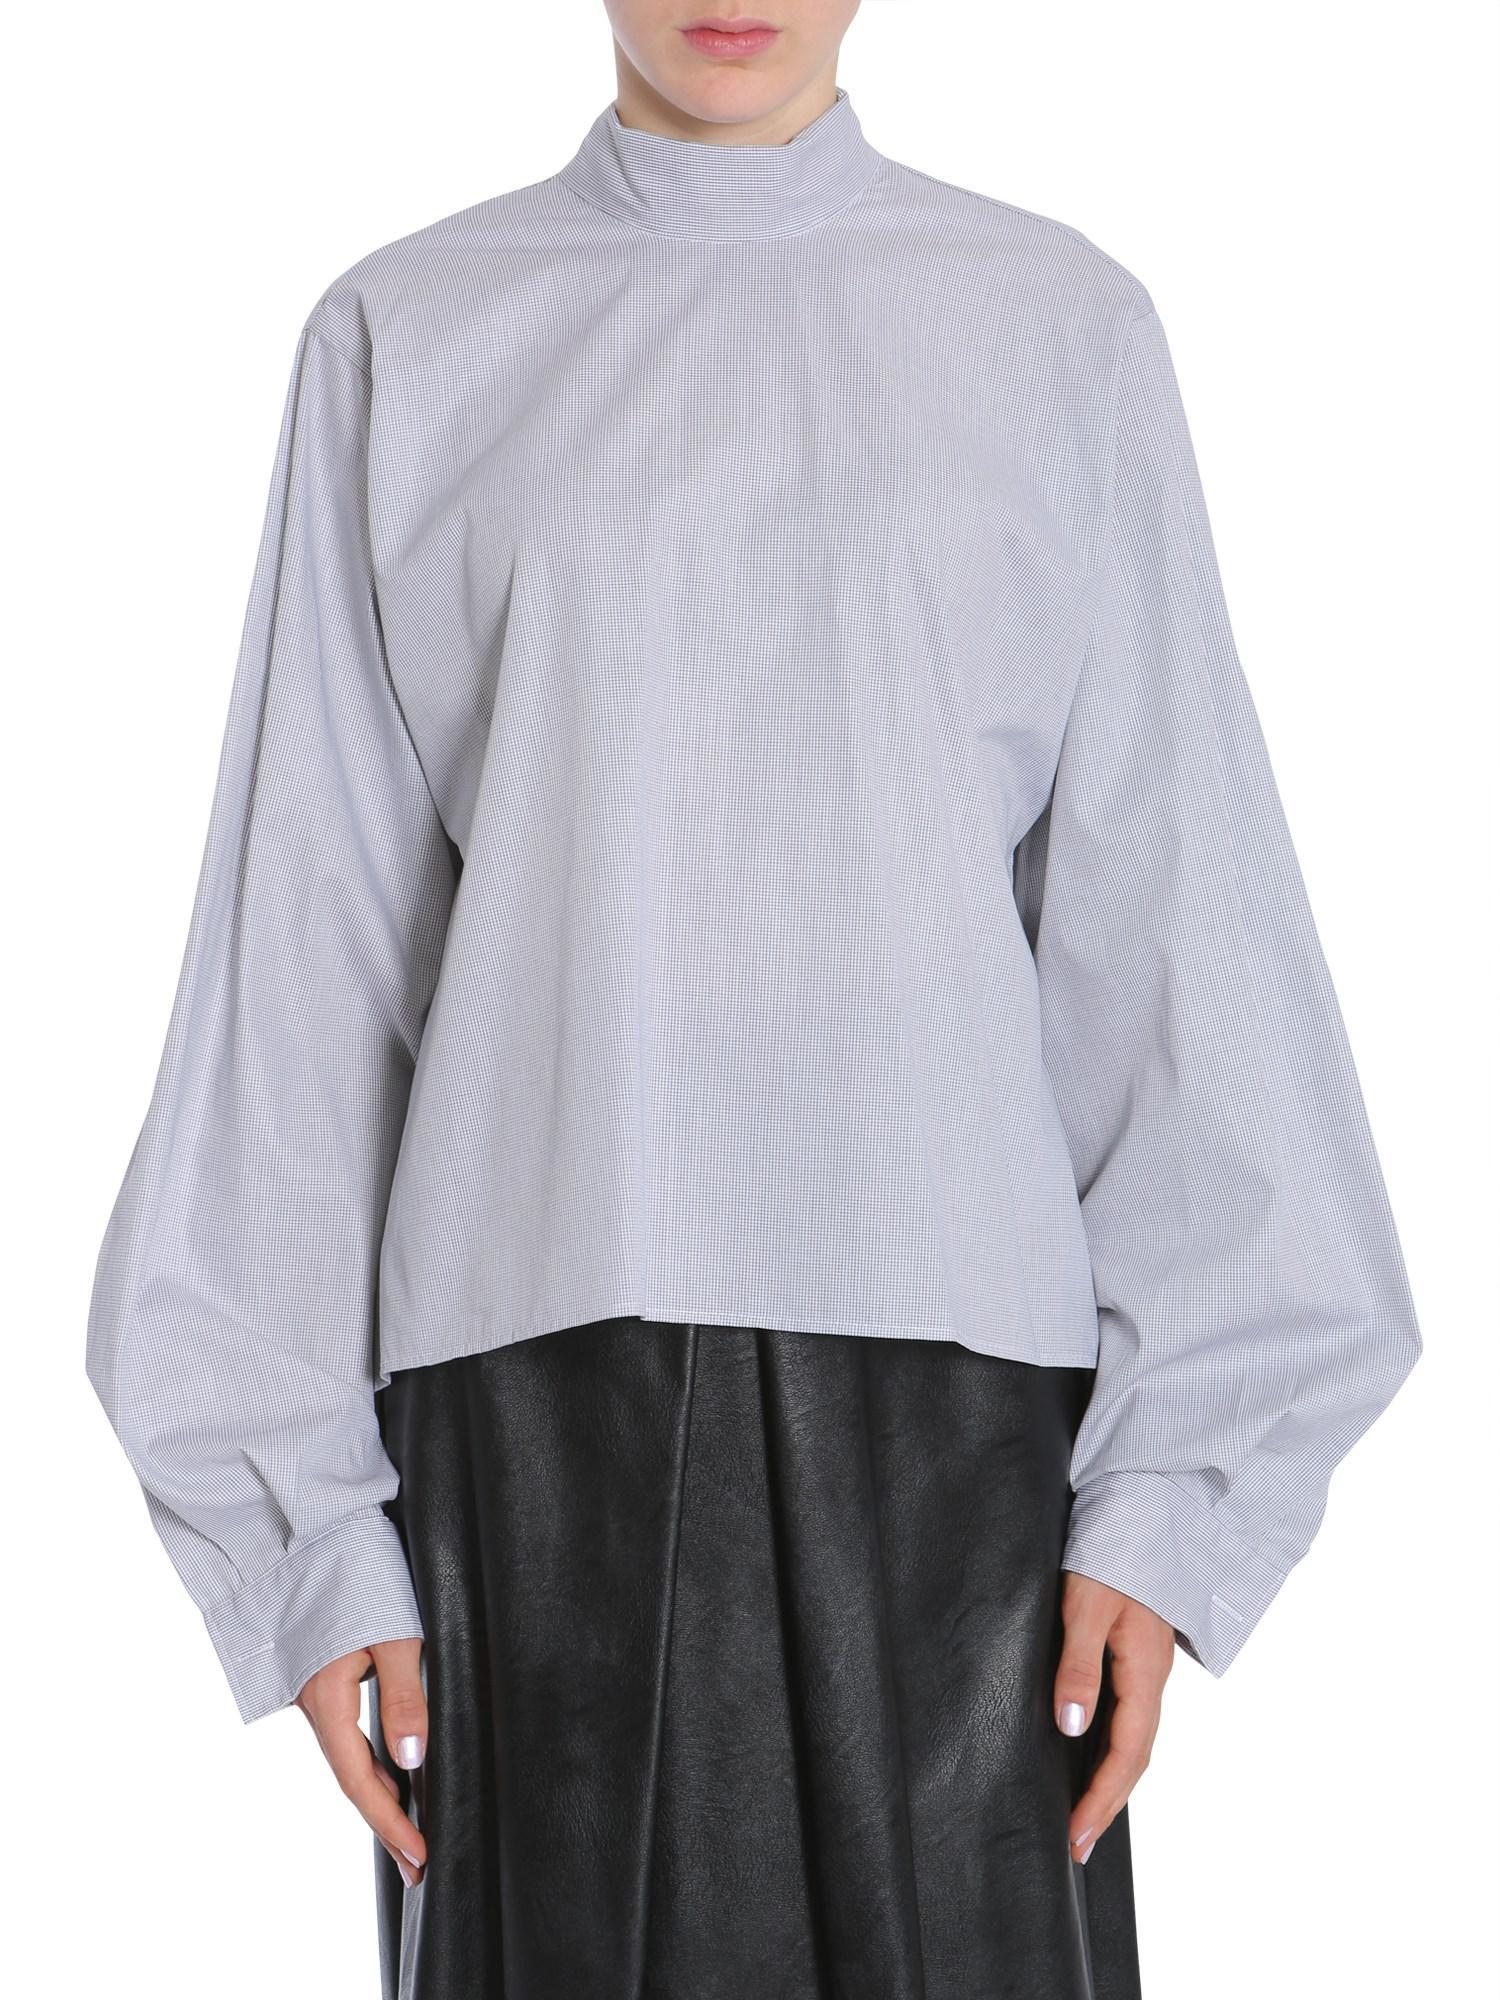 Maison Margiela Woman Appliquéd Striped Cotton-poplin Shirt Blue Size 40 Maison Martin Margiela Clearance Ebay v1texWEEV